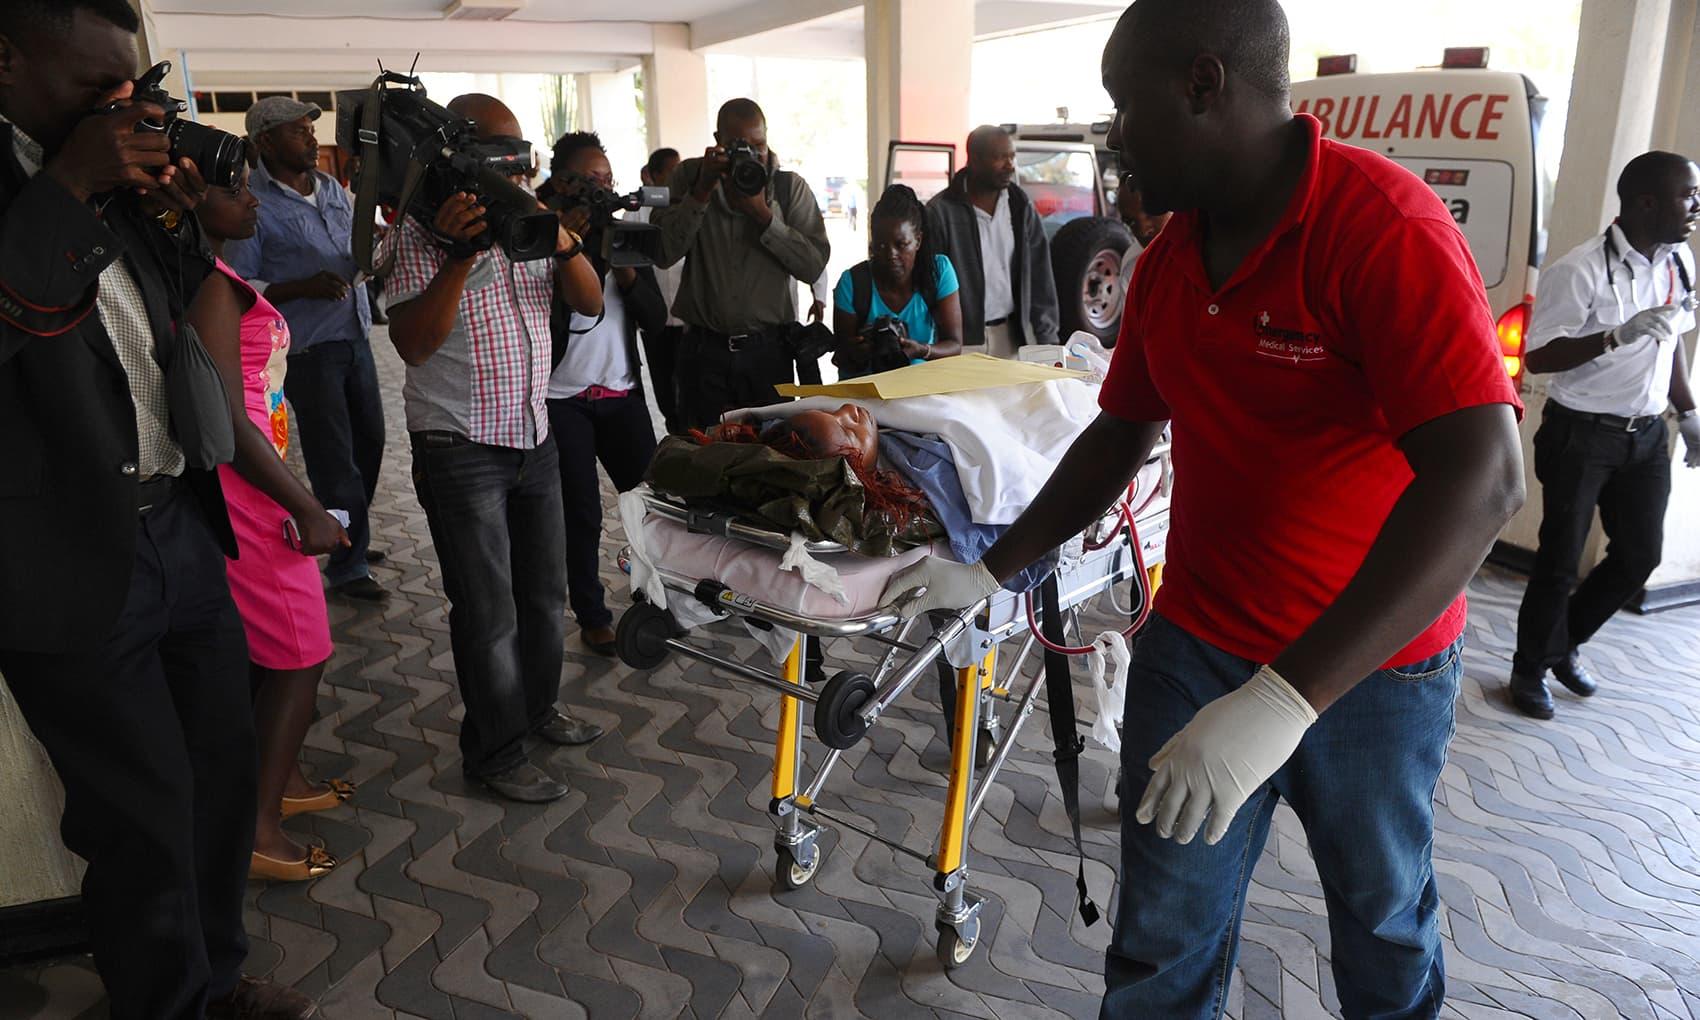 Medics help an injured person at Kenyatta National  Hospital in Nairobi, Kenya. -AP